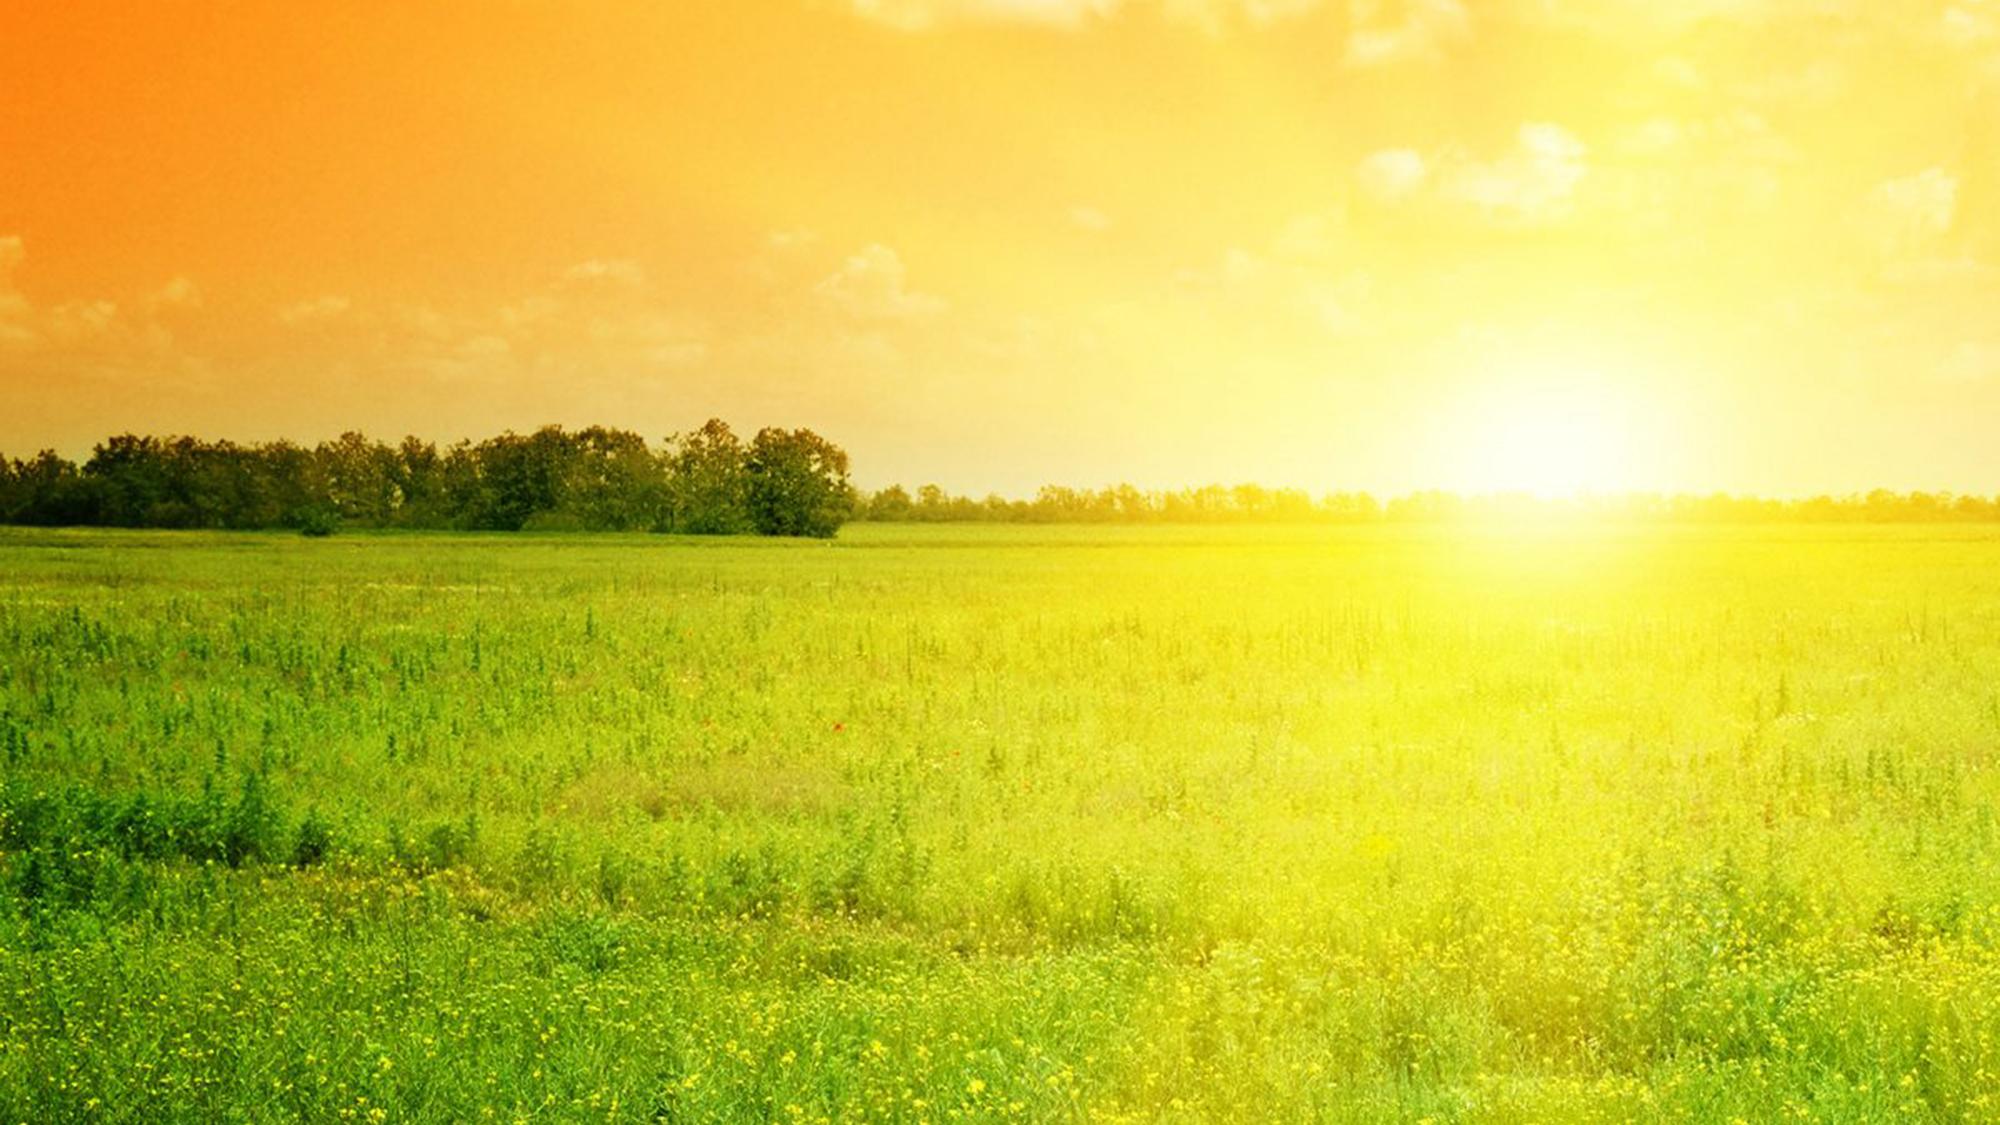 Sun over field